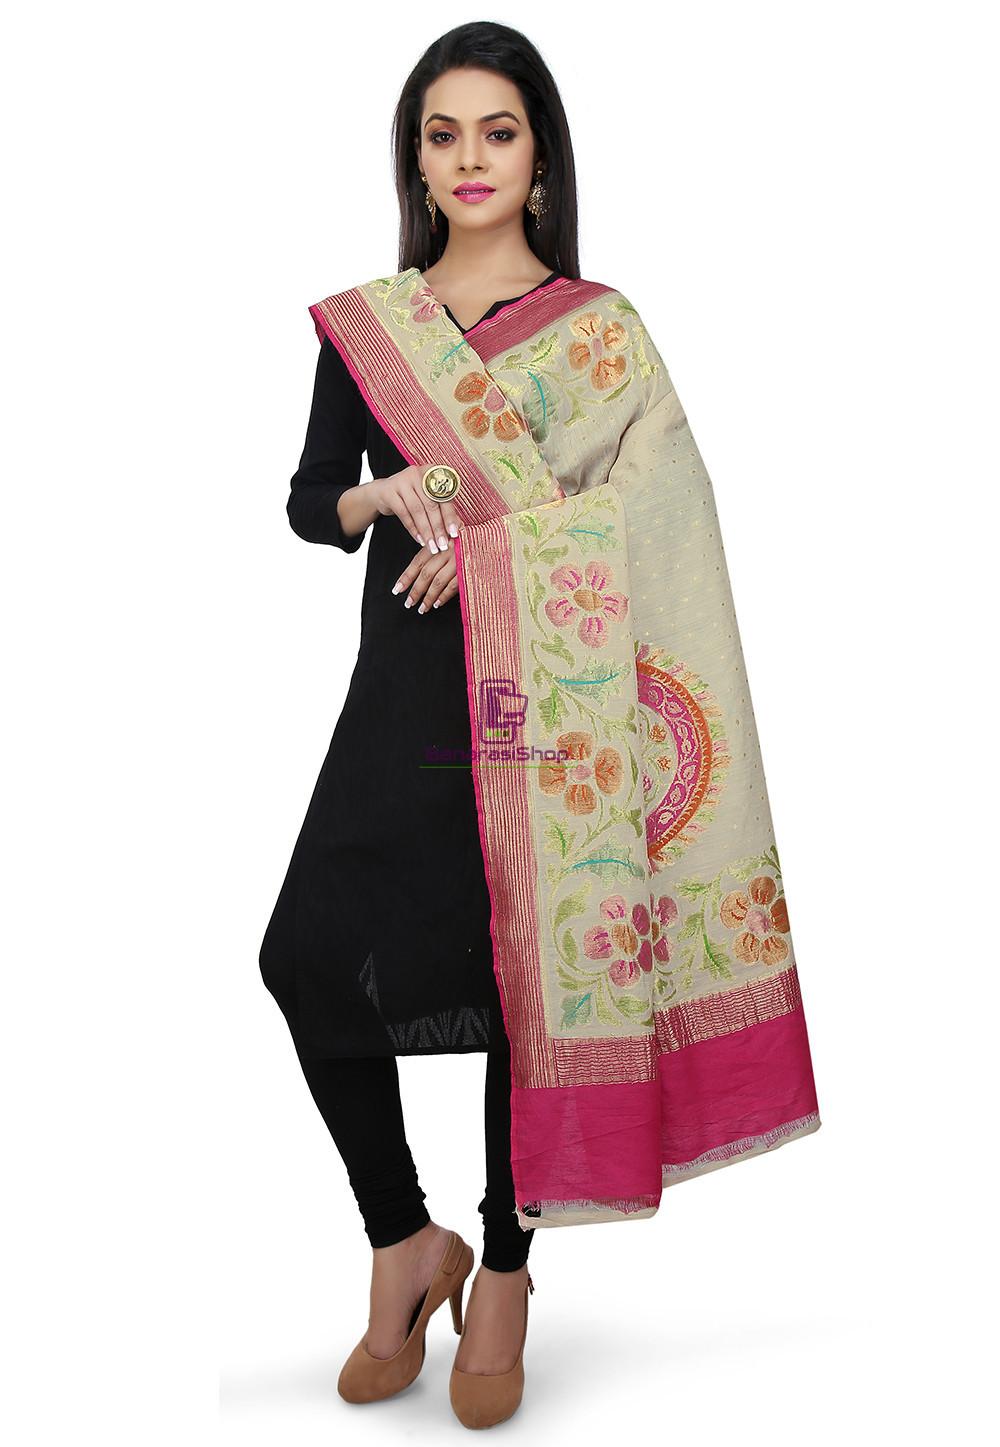 Handloom Banarasi Pure Muga Silk Dupatta in Light Beige and Fuchsia 1